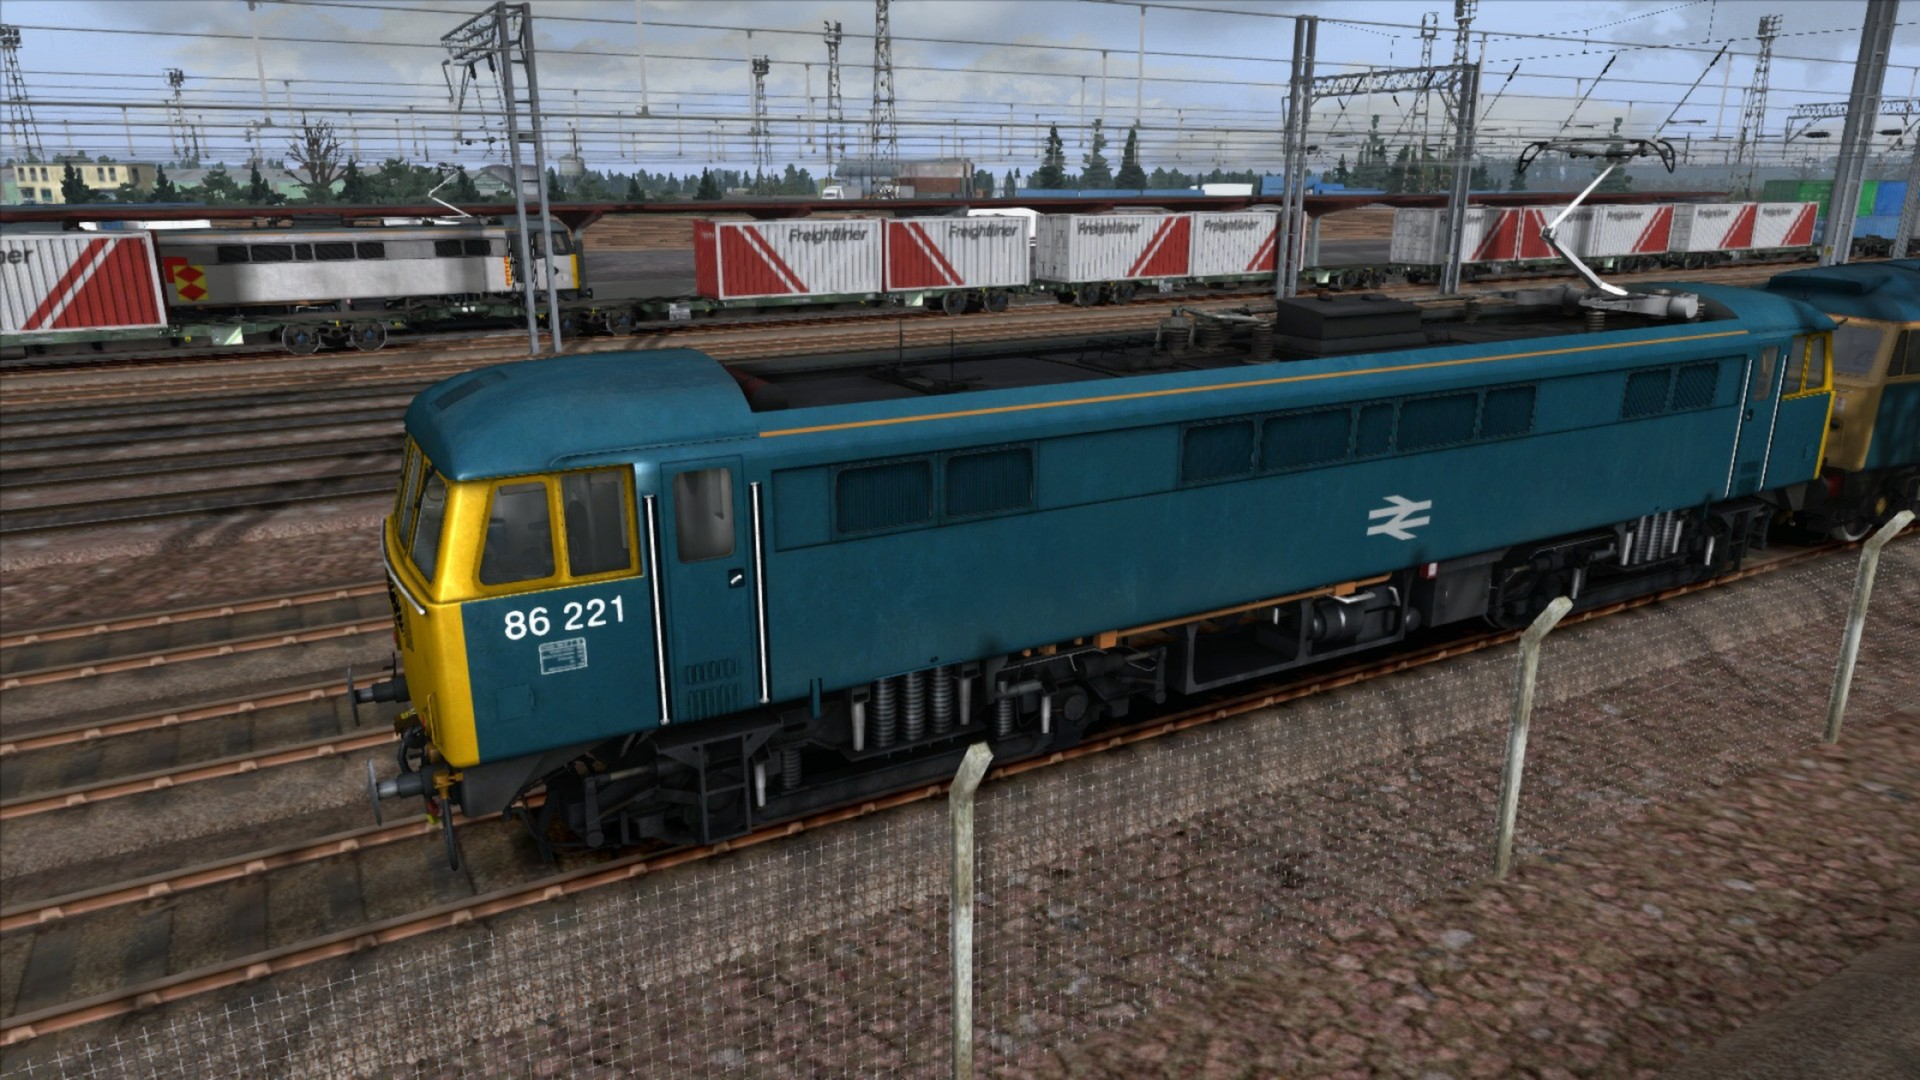 f5927c4d659 Save 60% on Train Simulator: Class 86 Loco Add-On on Steam